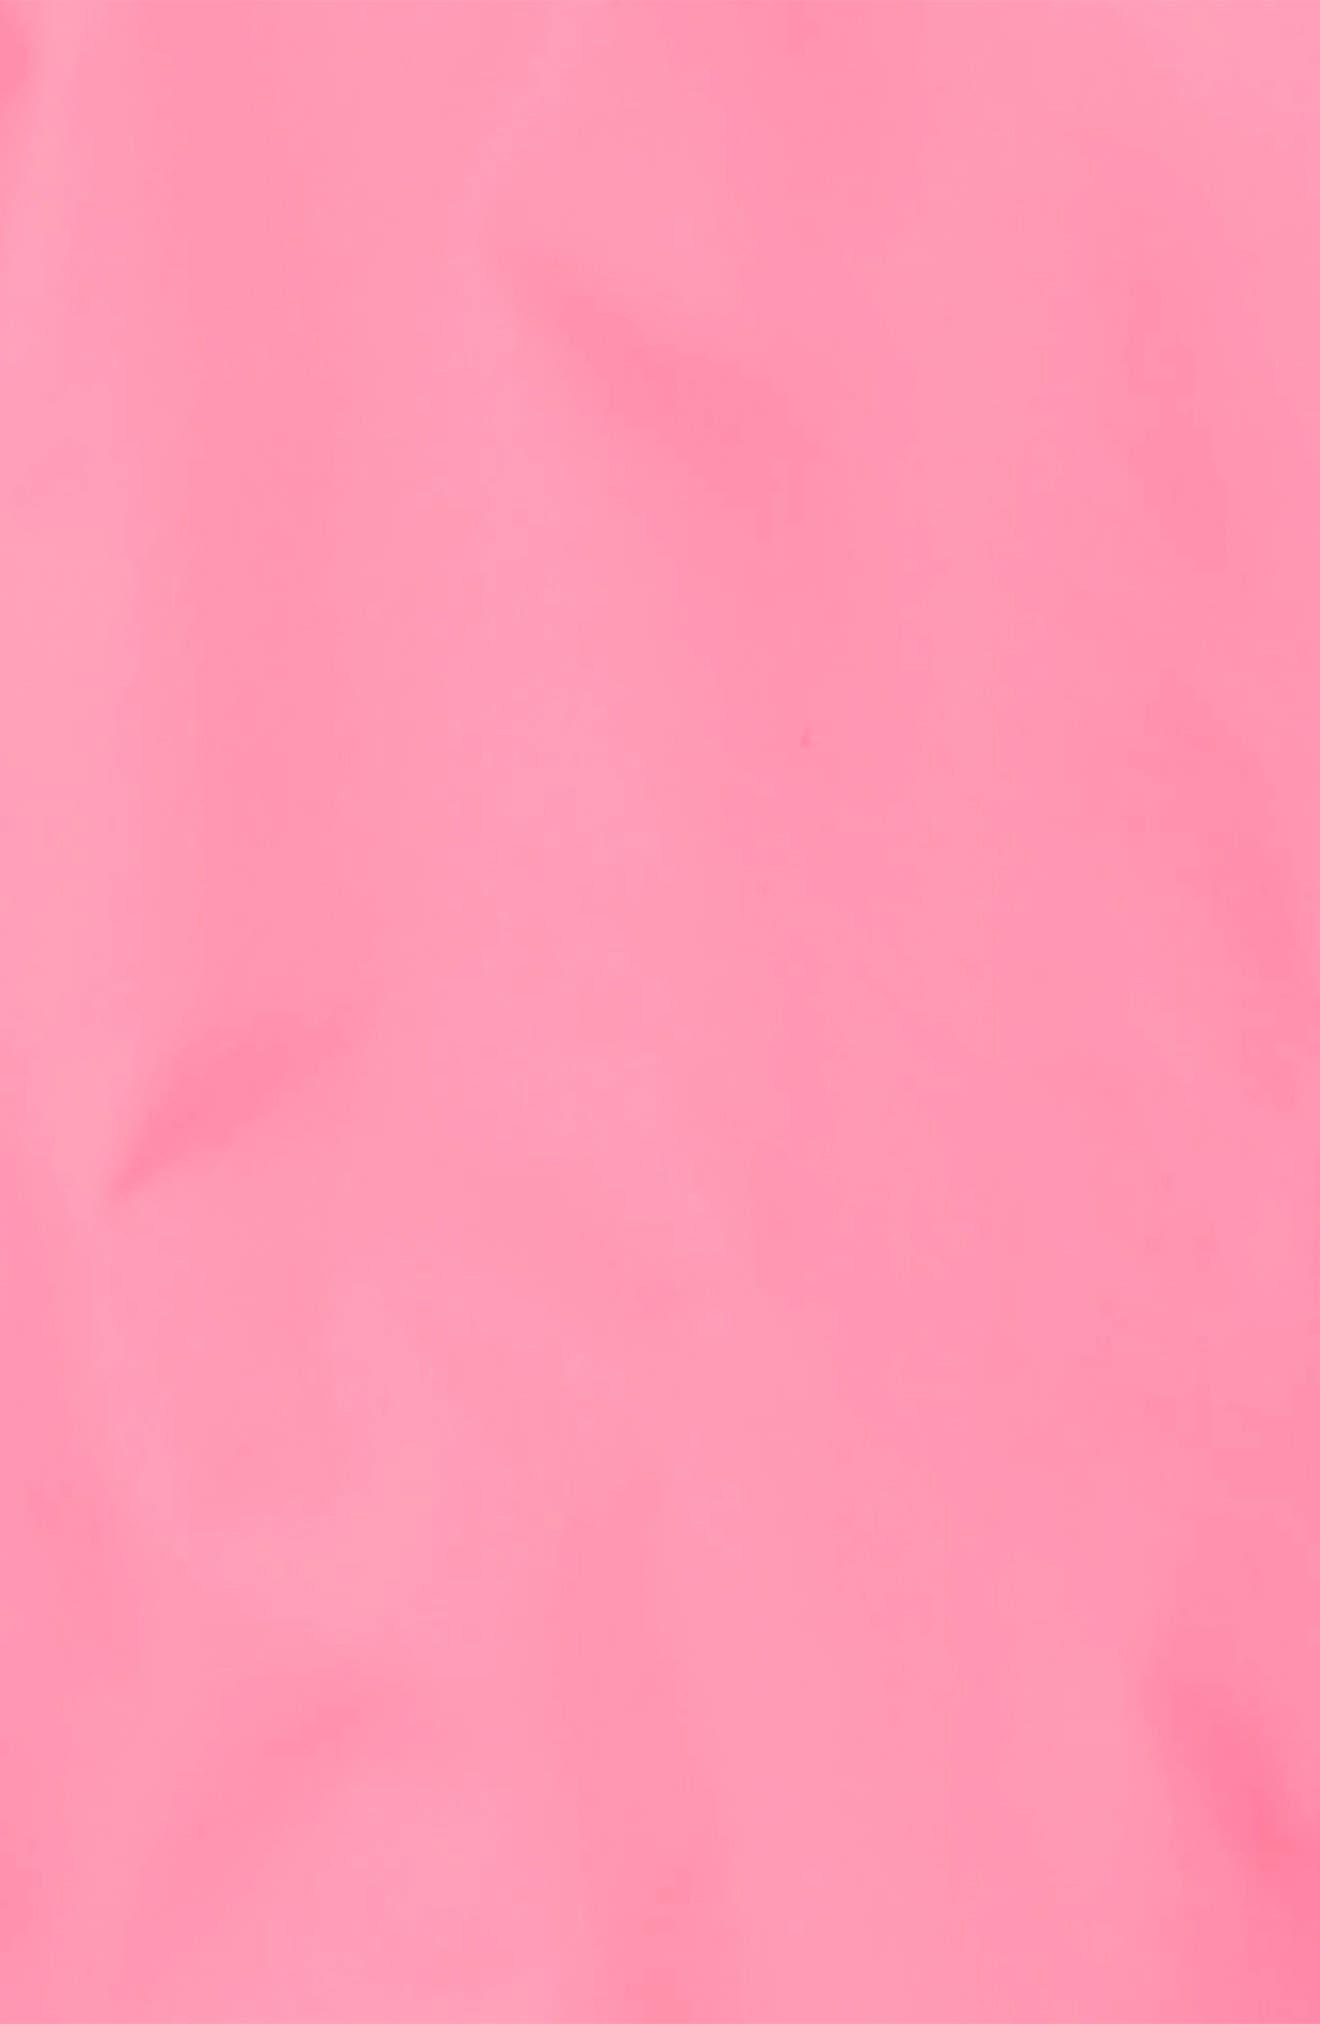 Tailout Waterproof Pants,                             Alternate thumbnail 2, color,                             Gem Pink